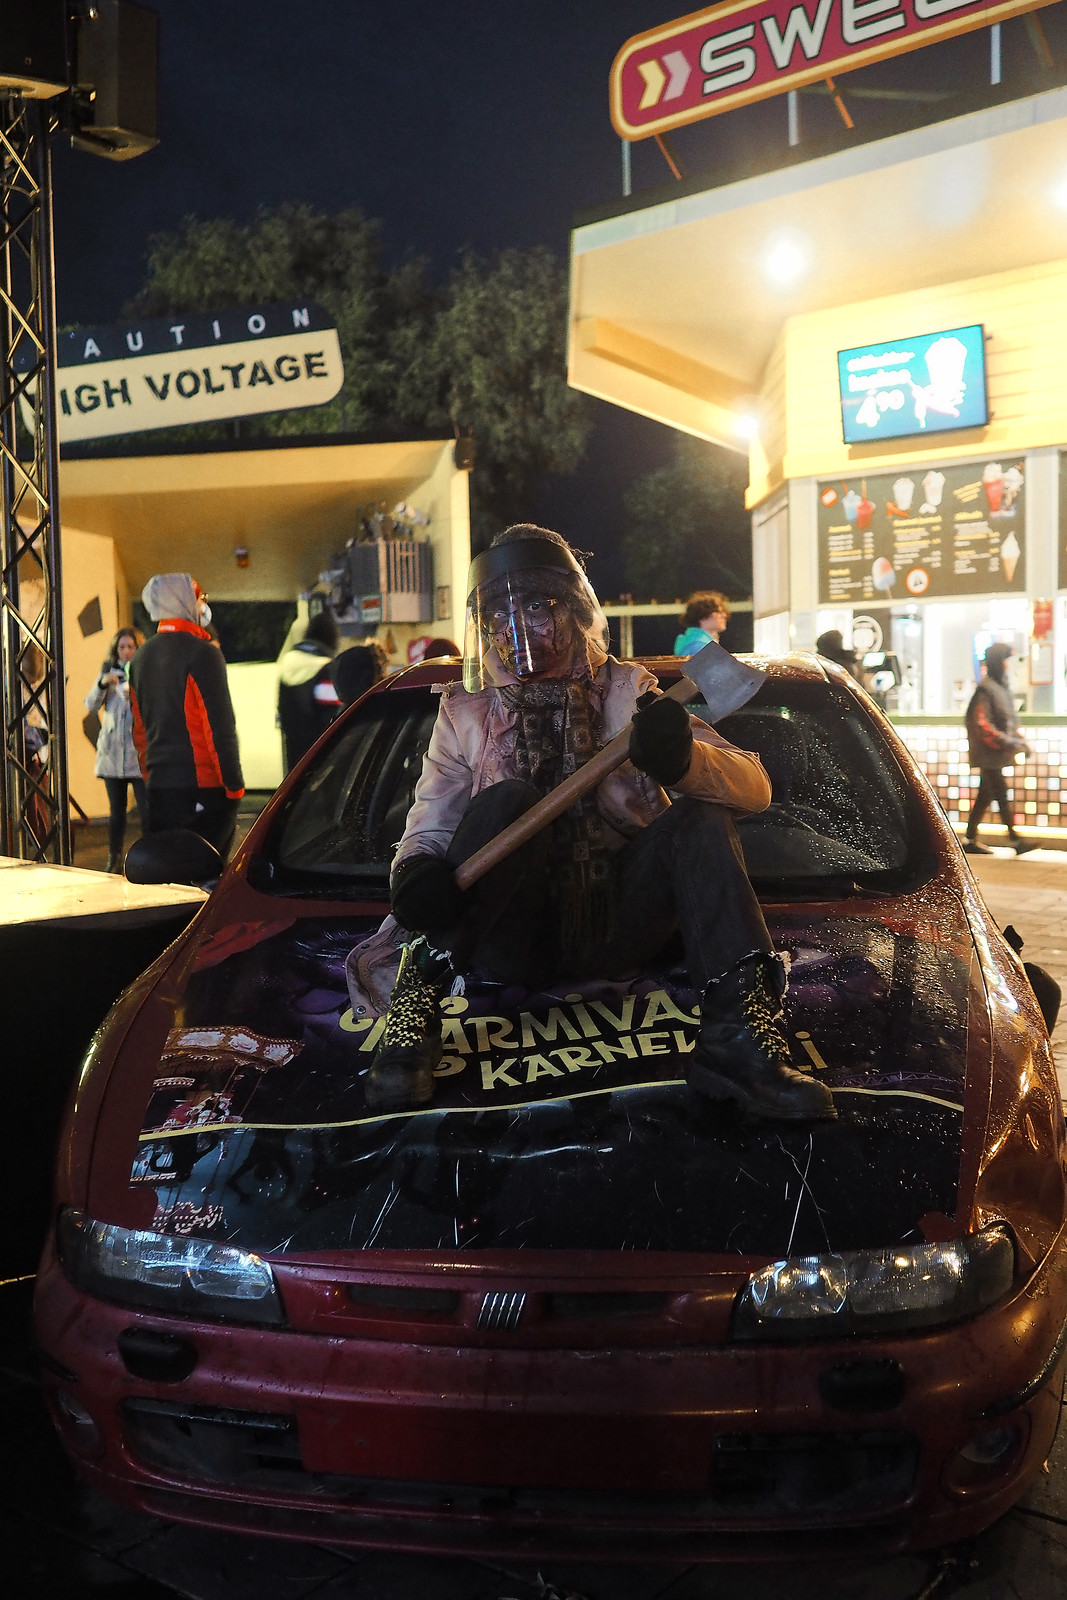 karmiva karnevaali visiiri zombi